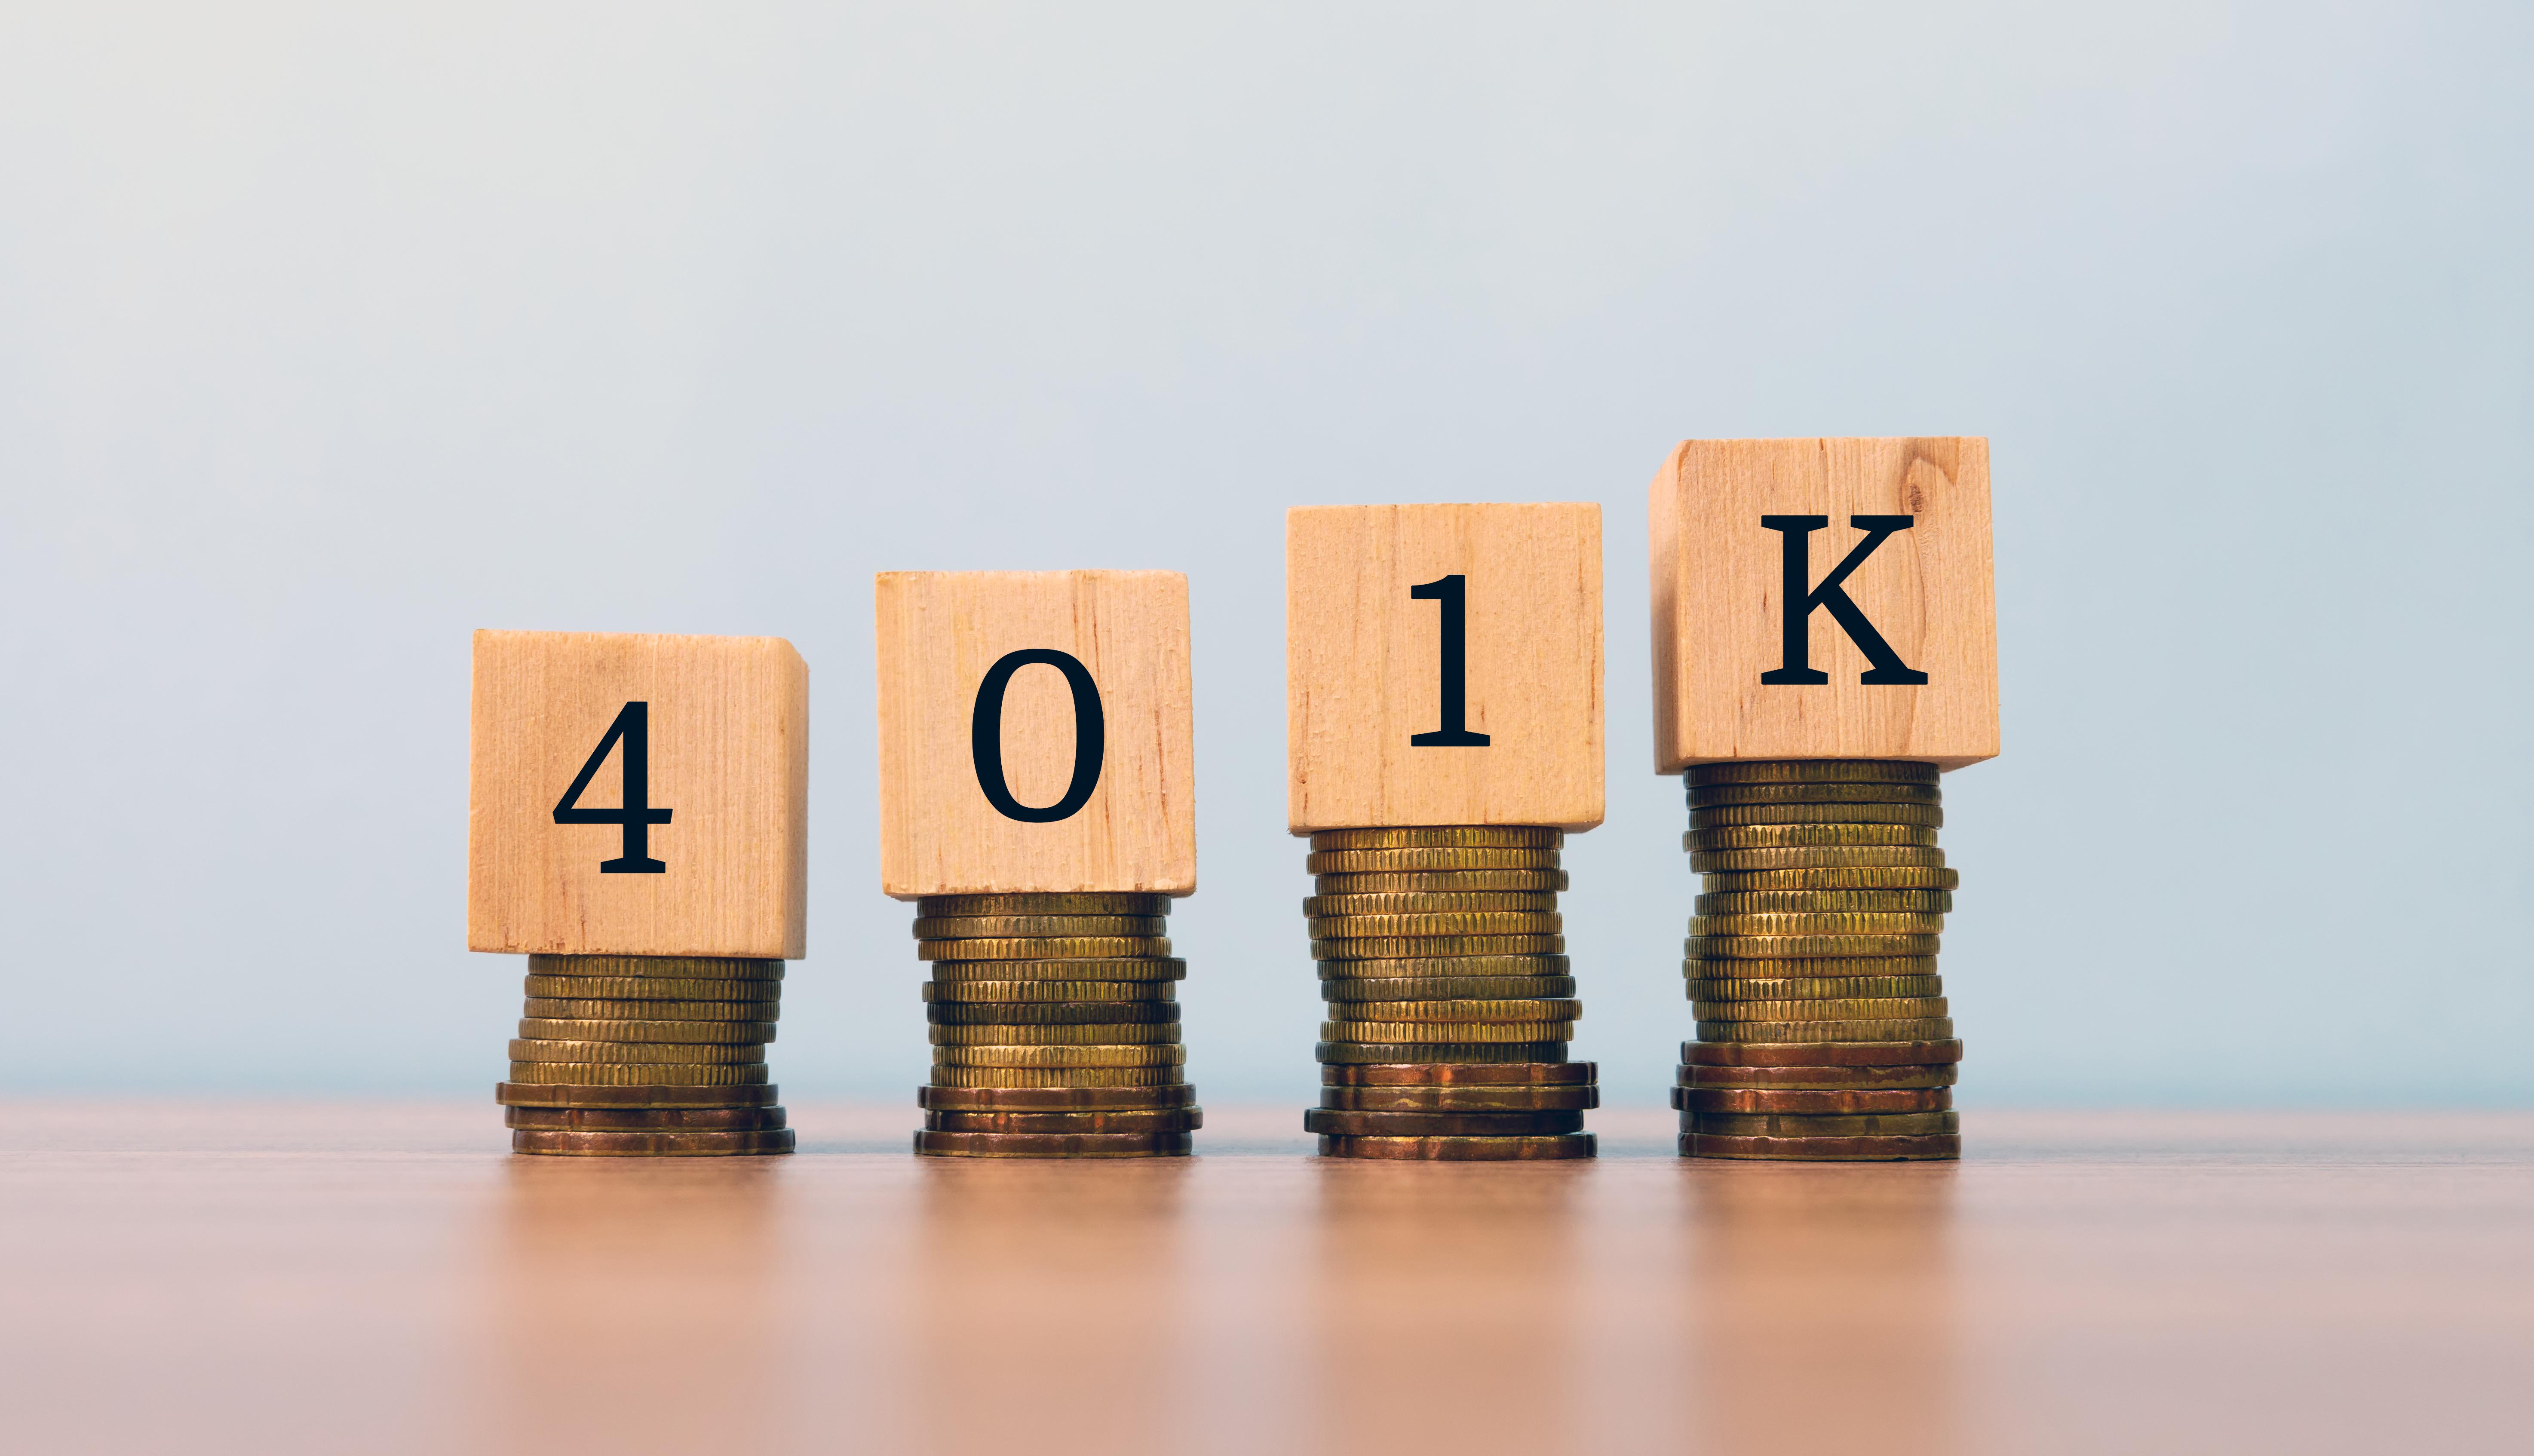 retirement savings coins